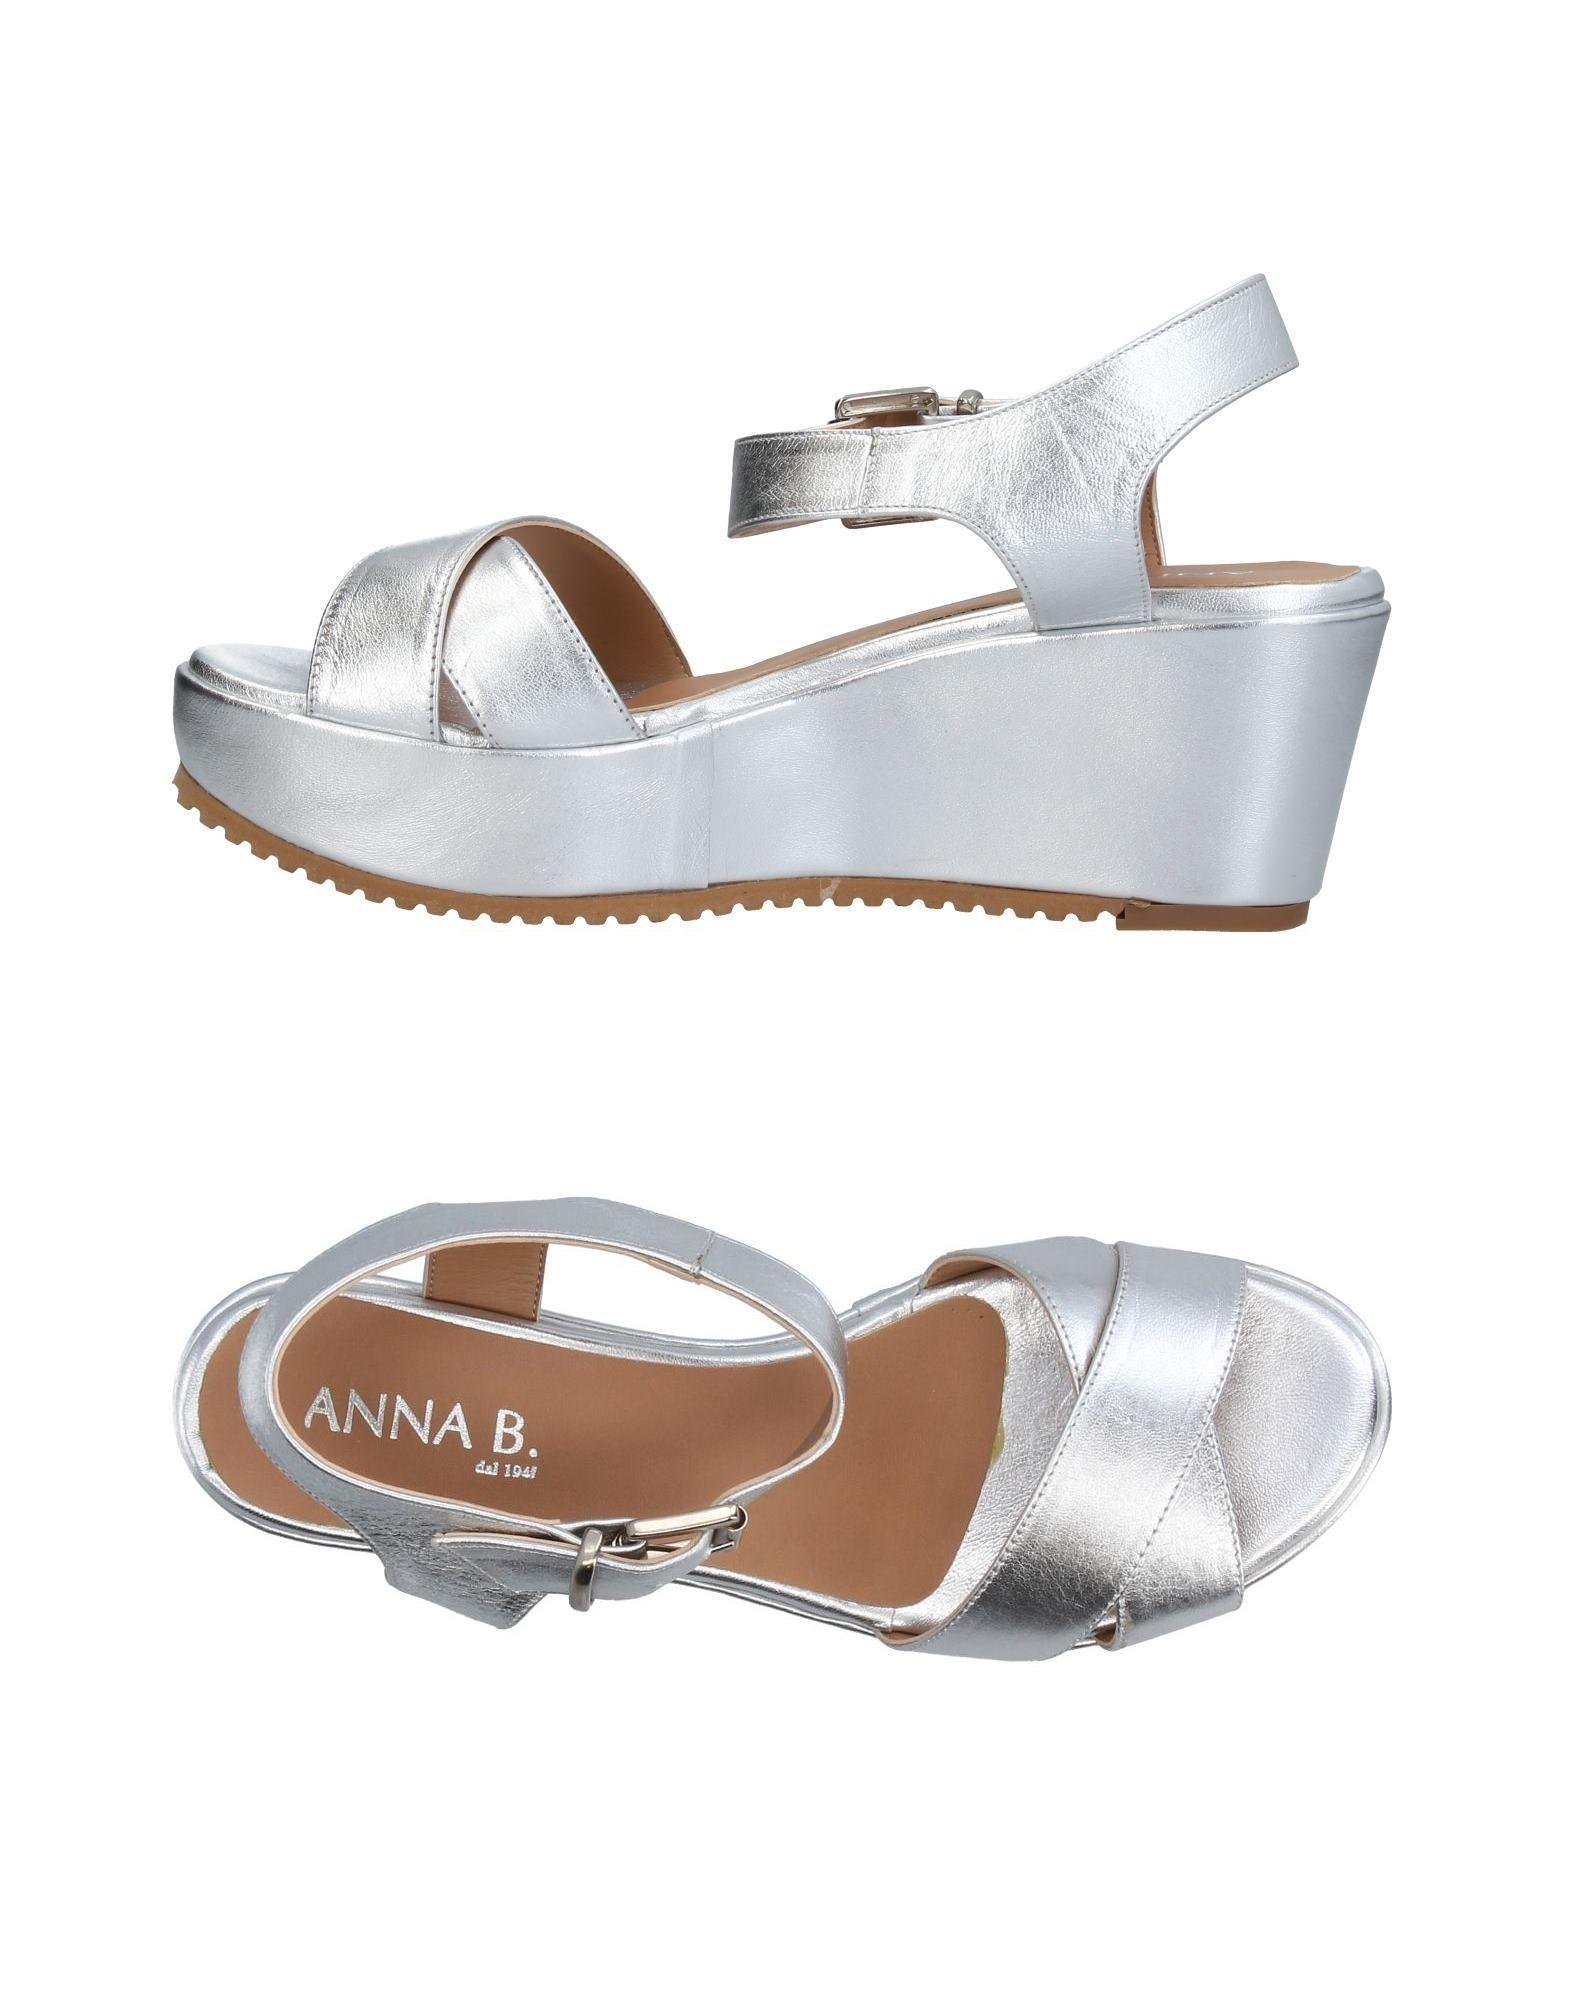 Sandales Anna B. Dal 1943 Femme - Sandales Anna B. Dal 1943 sur